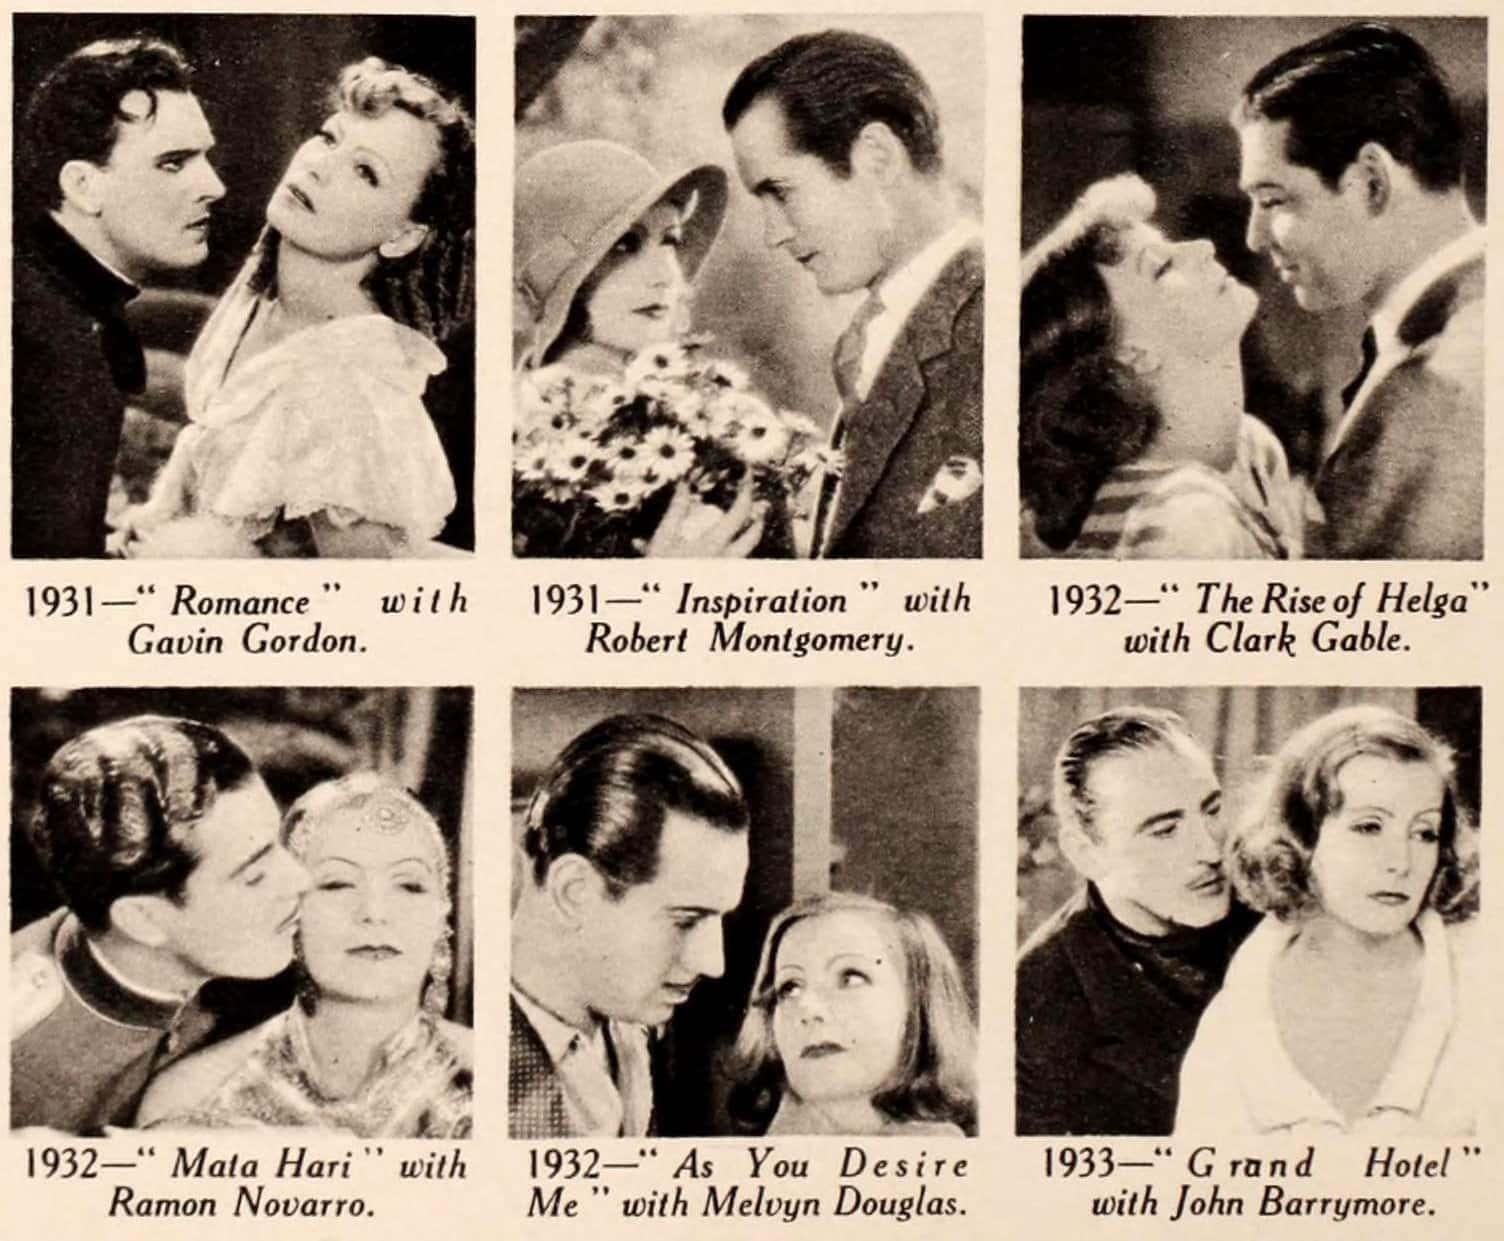 Films of Greta Garbo as of 1934